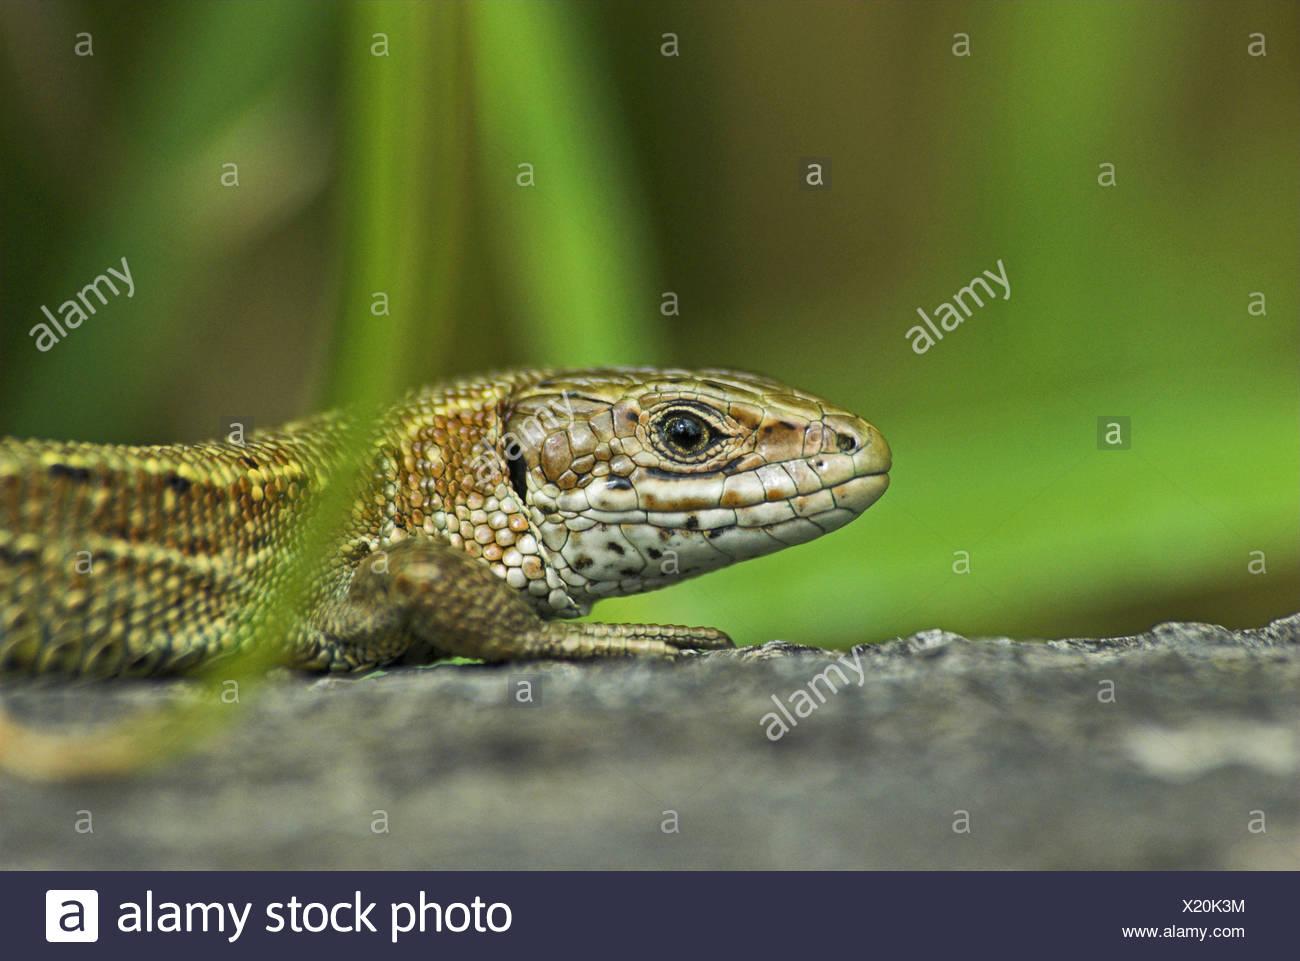 Basking common lizard (lacerta vivipara). Stock Photo